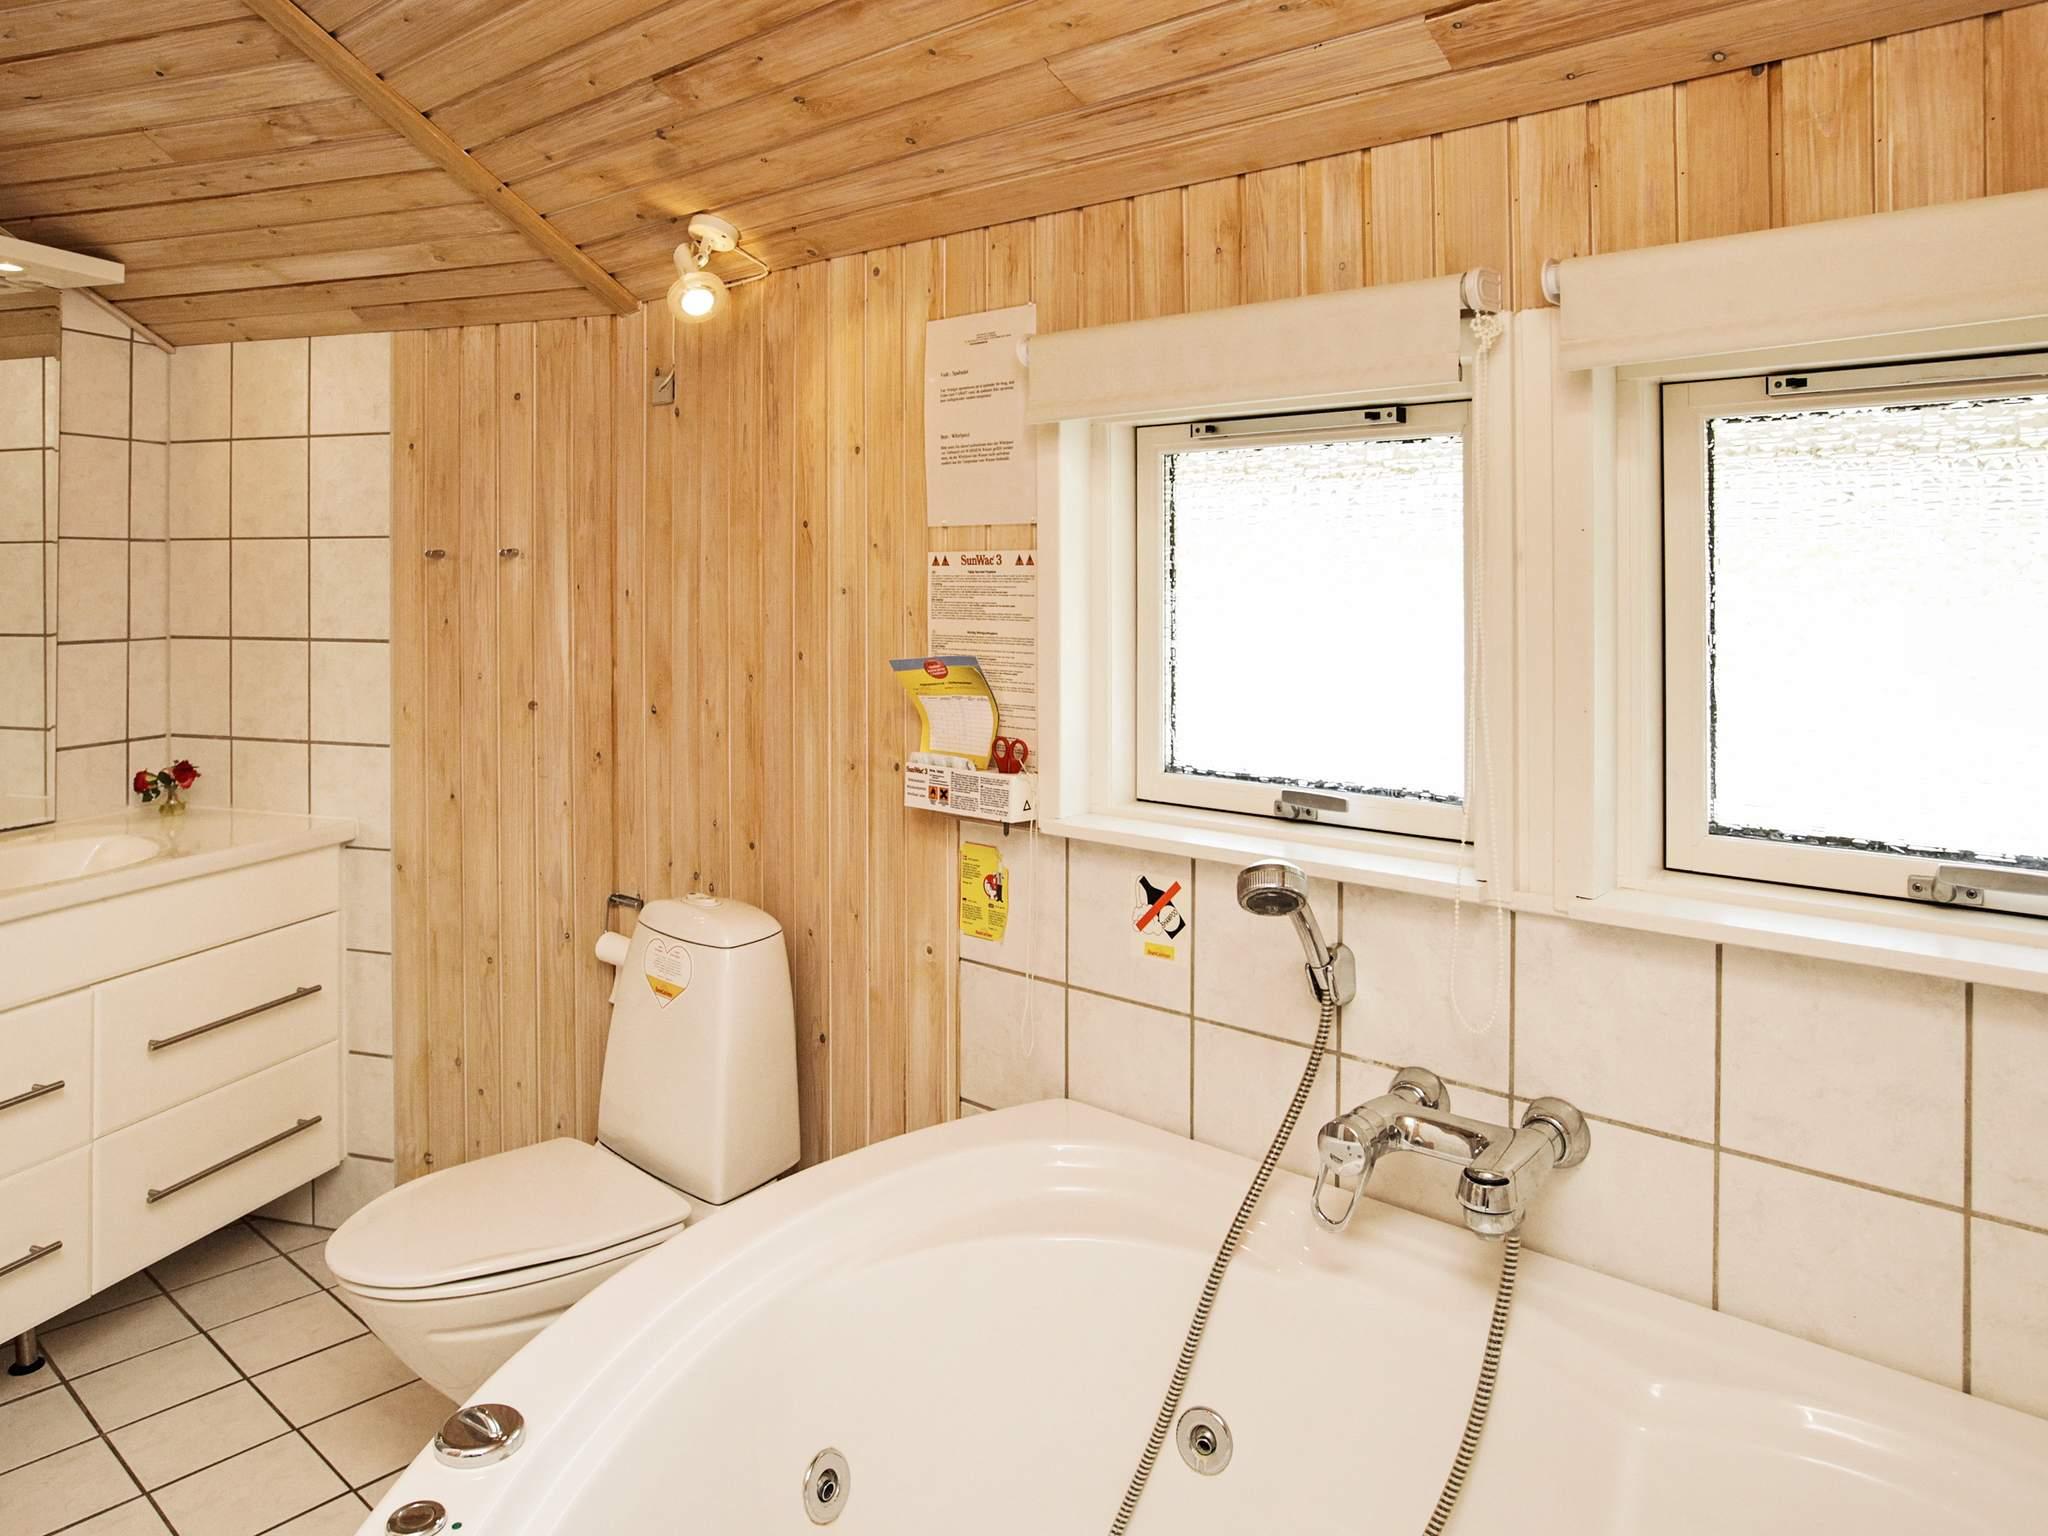 Maison de vacances Falsled (87545), Faldsled, , Fionie, Danemark, image 17